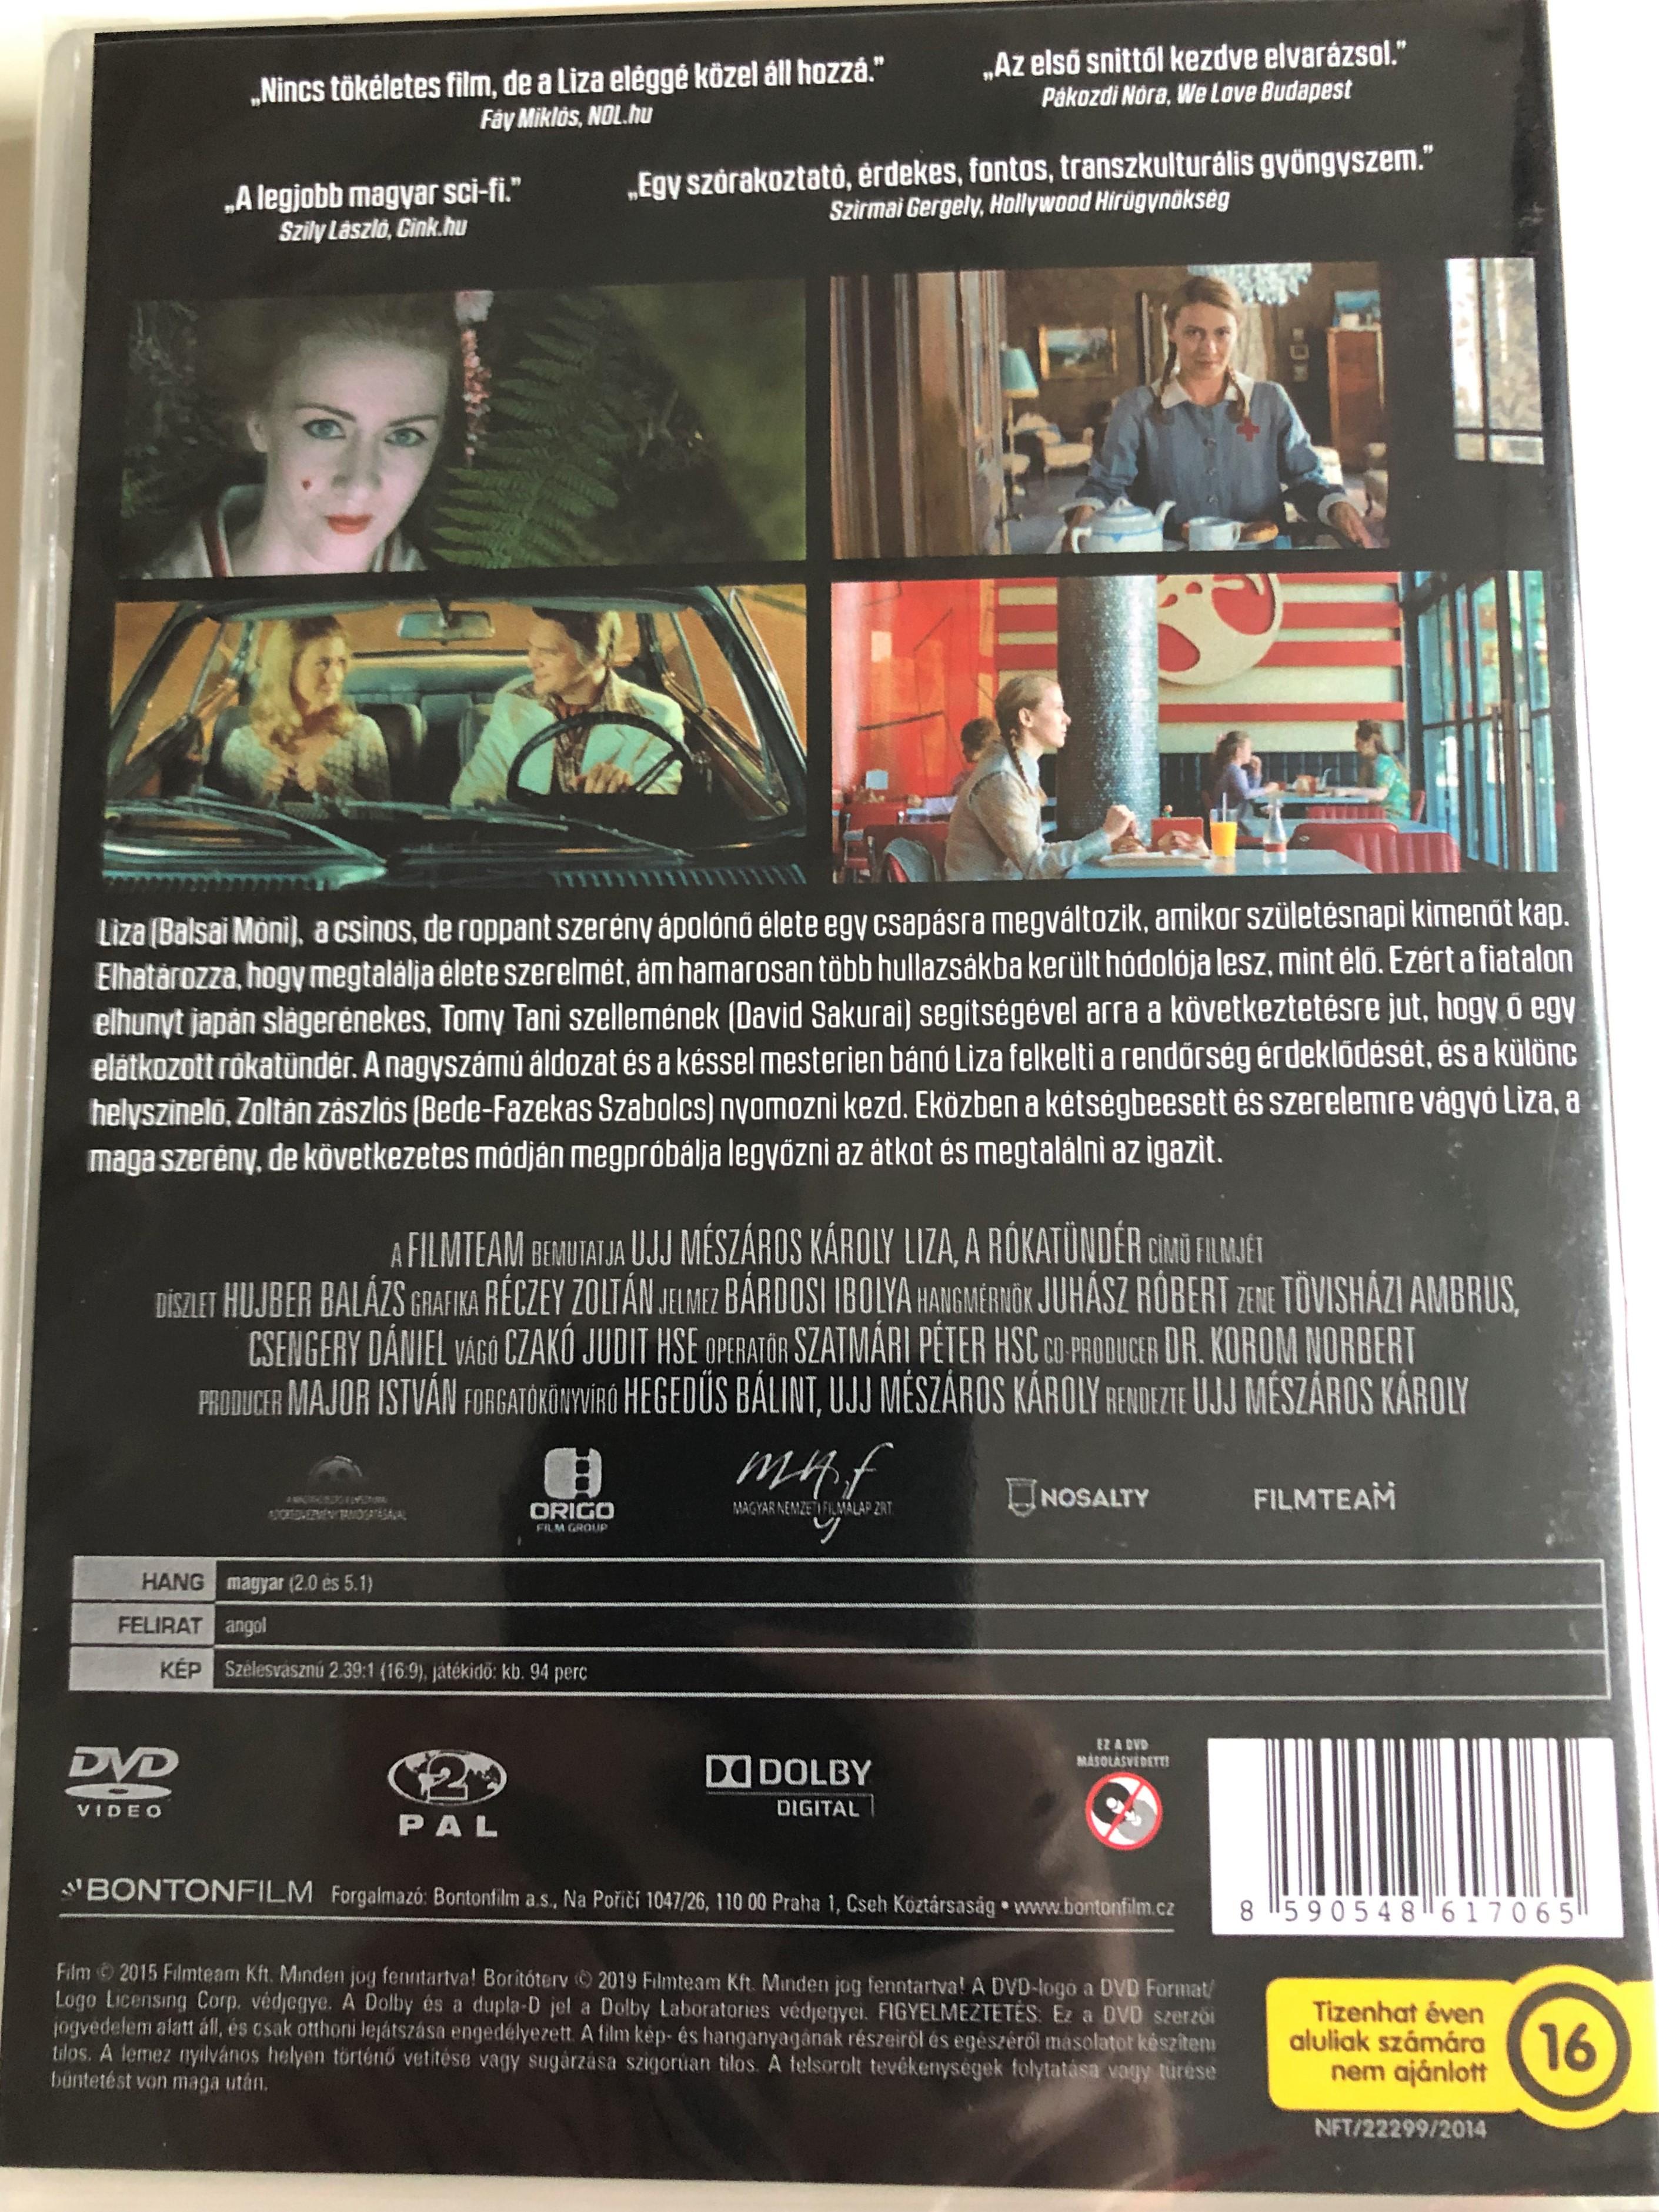 liza-a-r-kat-nd-r-dvd-2015-liza-the-fox-fairy-directed-by-ujj-m-sz-ros-k-roly-starring-balsai-m-ni-bede-fazekas-szabolcs-david-sakurai-filmteam-2-.jpg